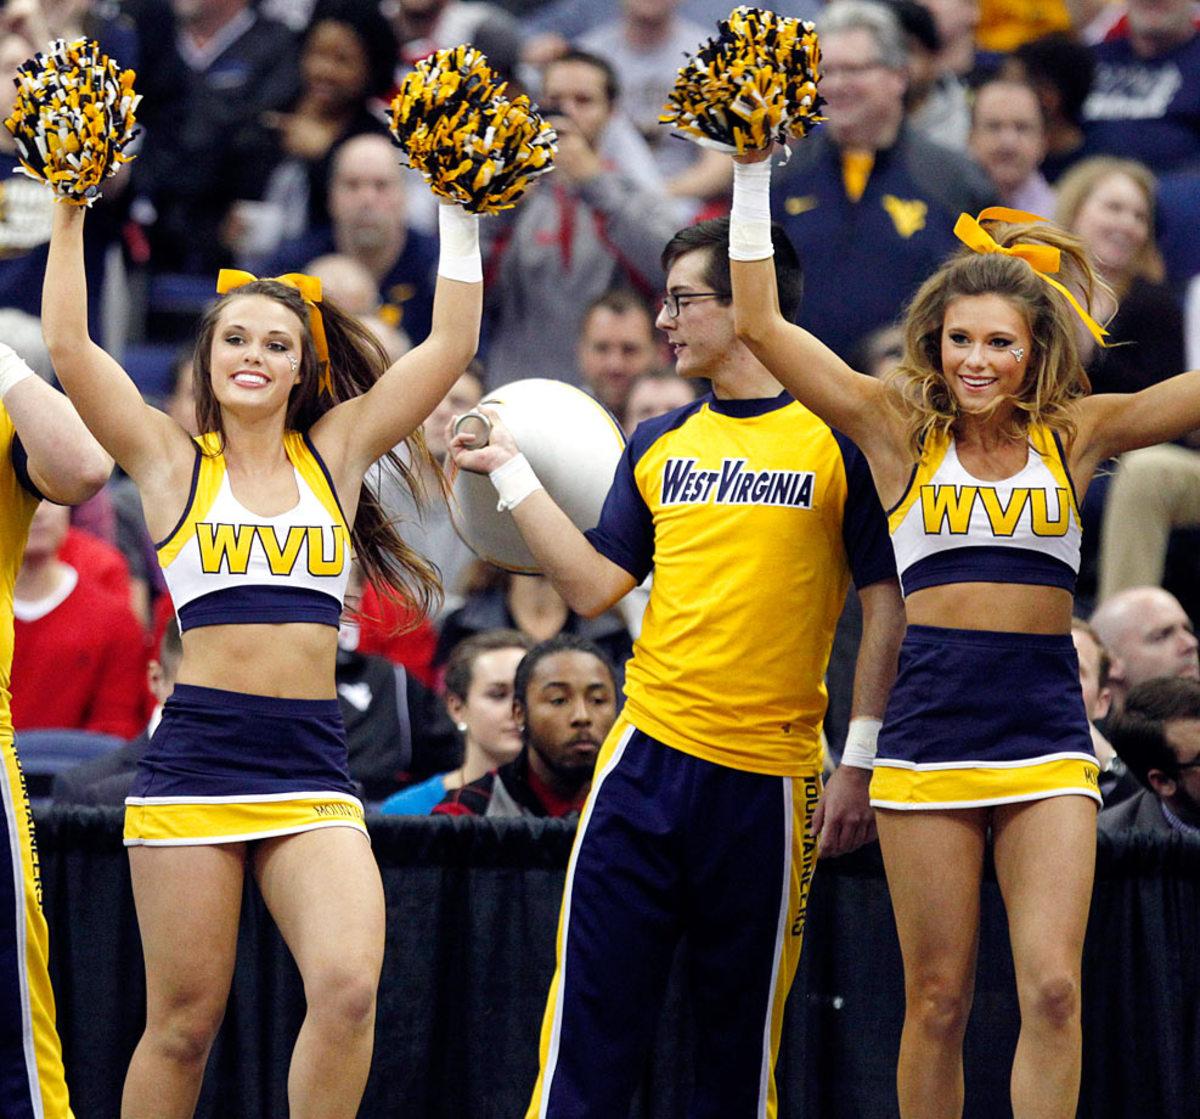 West-Virginia-cheerleaders-2081592101224b828486de3a98c32765-0.jpg